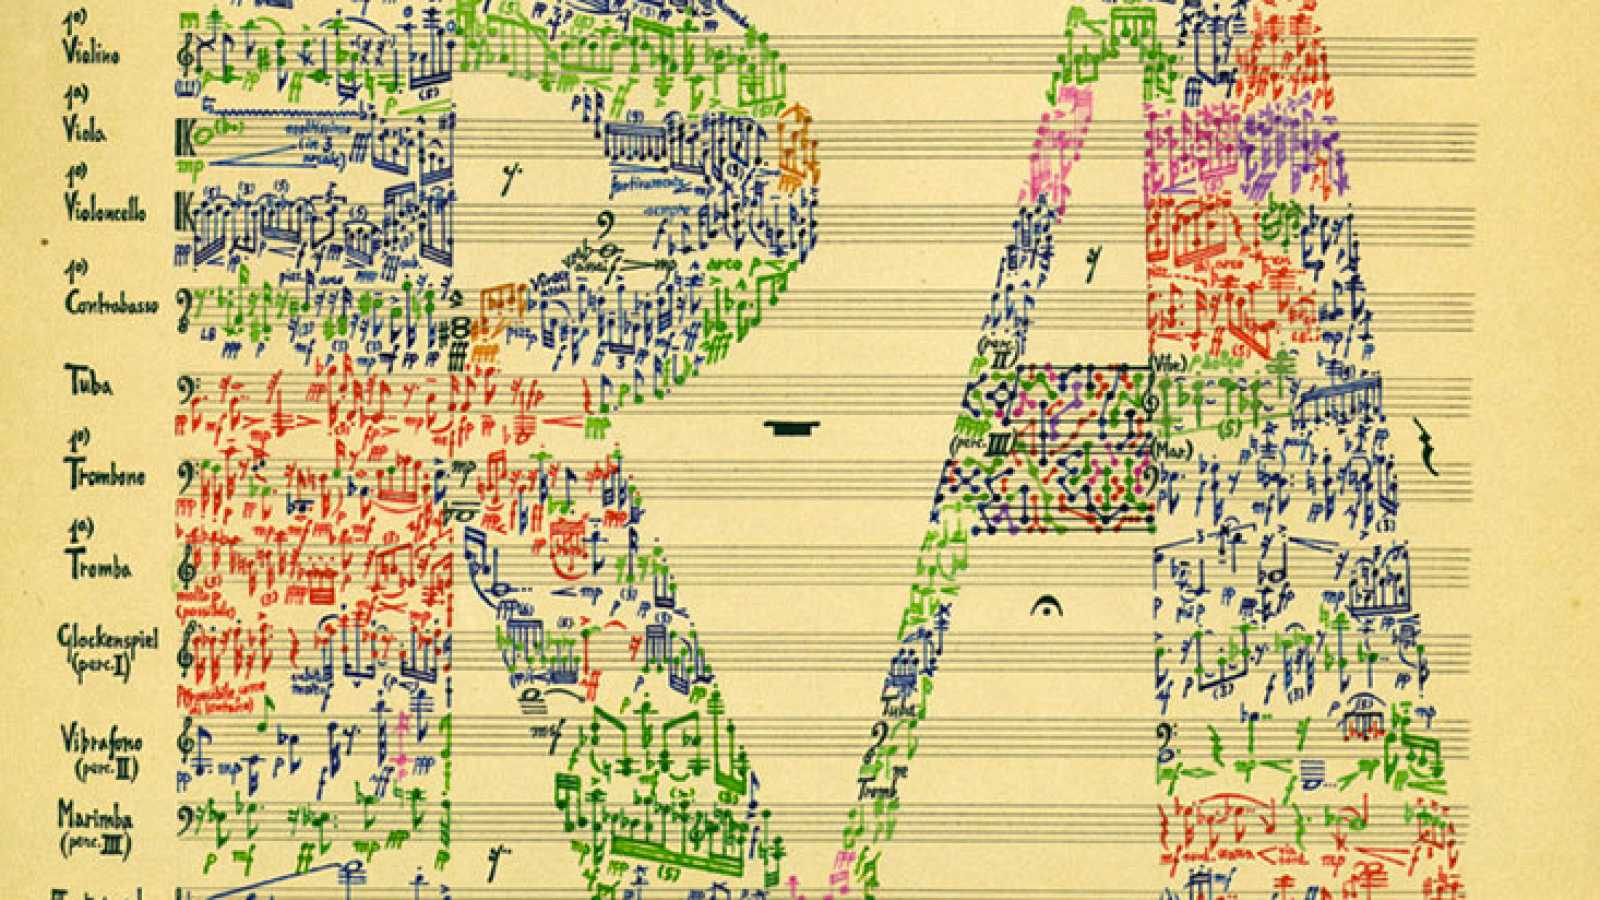 Música viva - Bestiarium de Nuria Núñez en Berlín - 21/01/18 - escuchar ahora